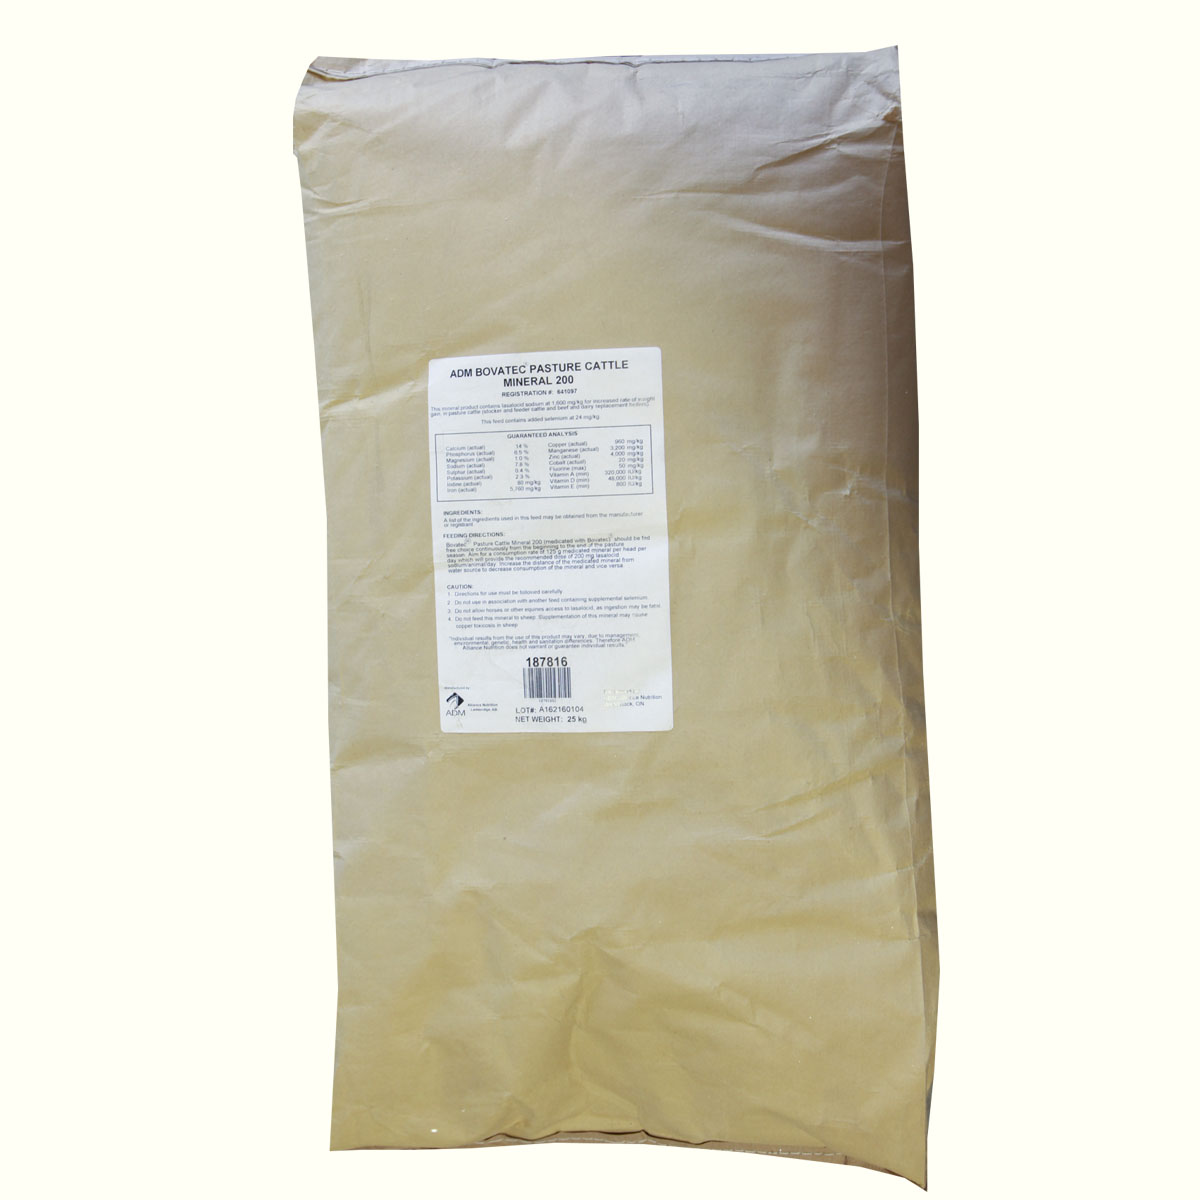 Bovatec Pasture Mineral 200 - 25 kg